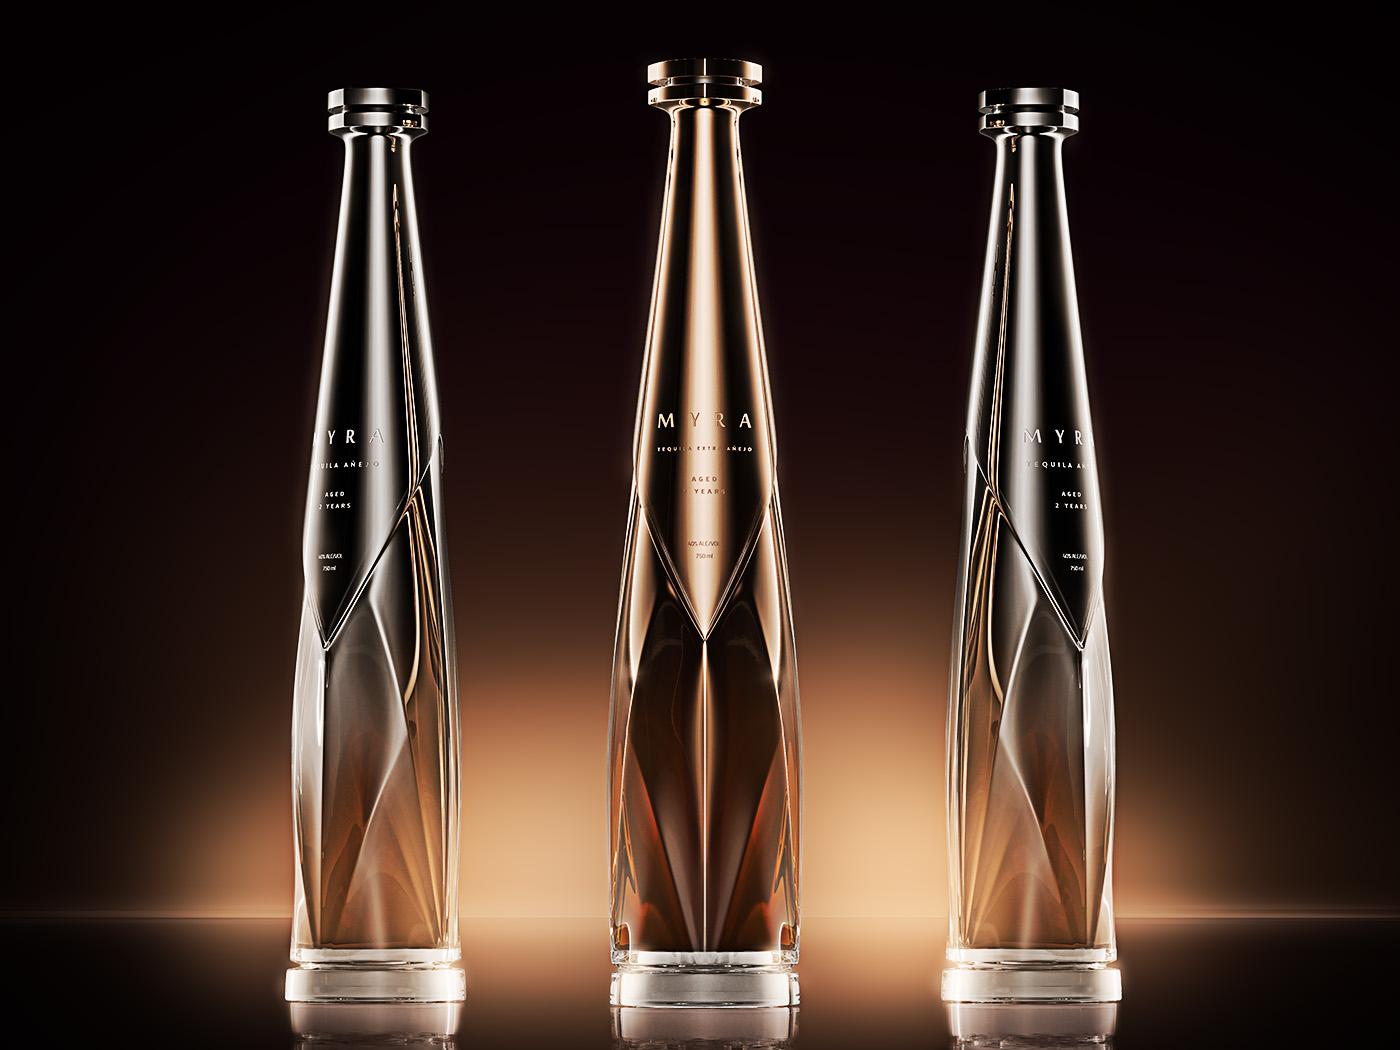 Luxury Tequila bottle Myra 1.jpg